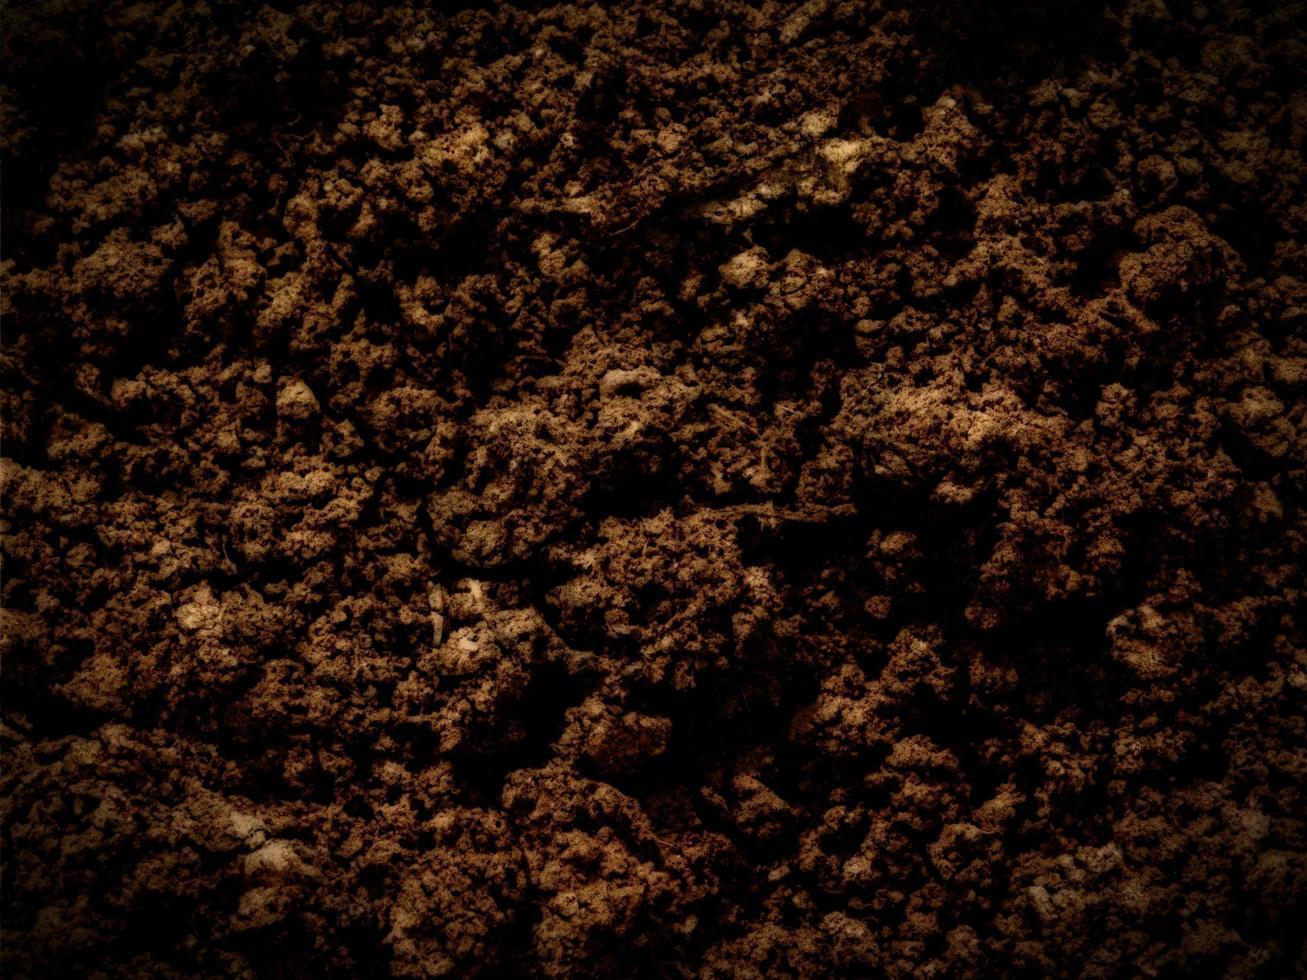 donkere aarde textuur foto